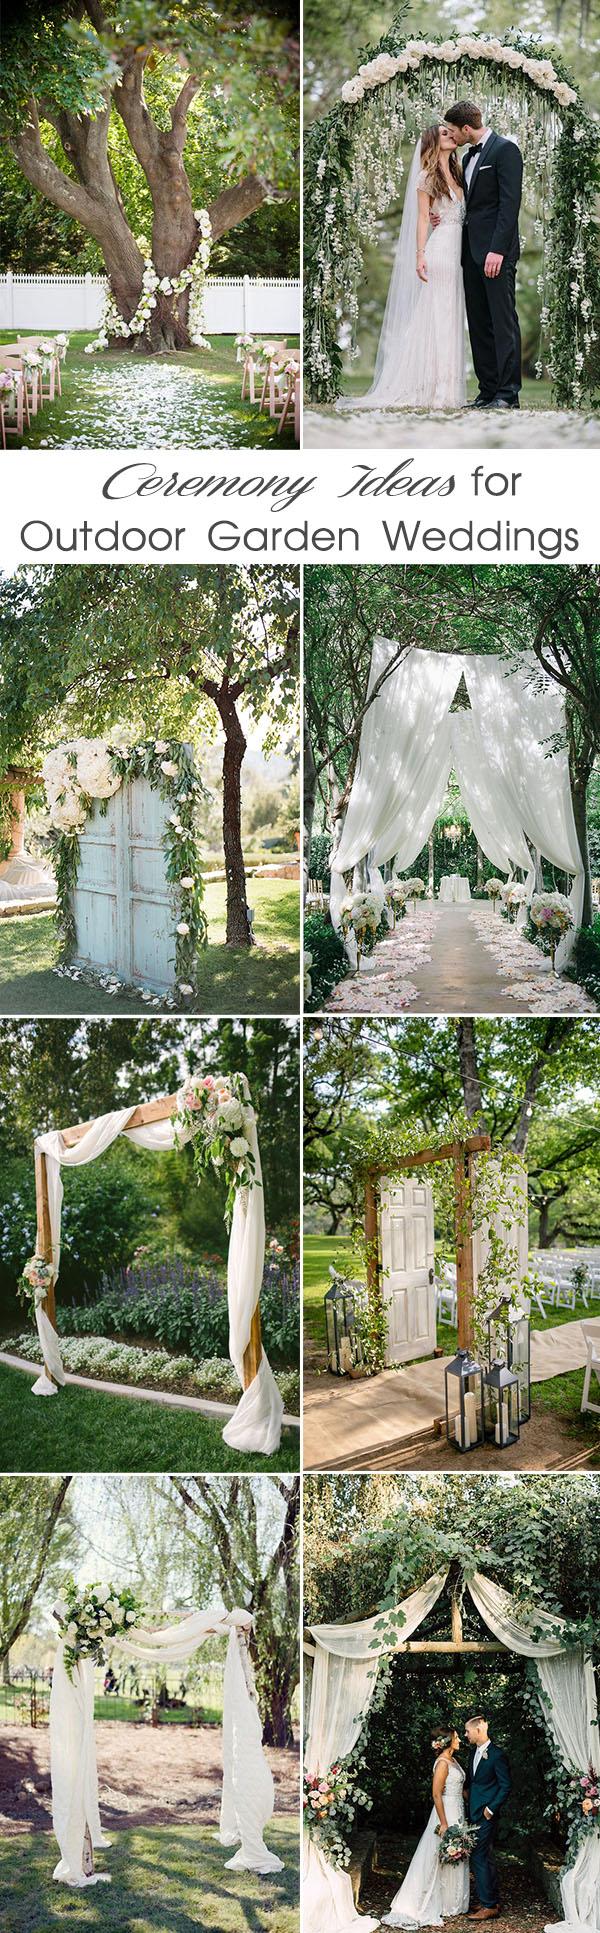 Outdoor Wedding Ideas 48 Most Inspiring Garden Inspired Wedding Ideas